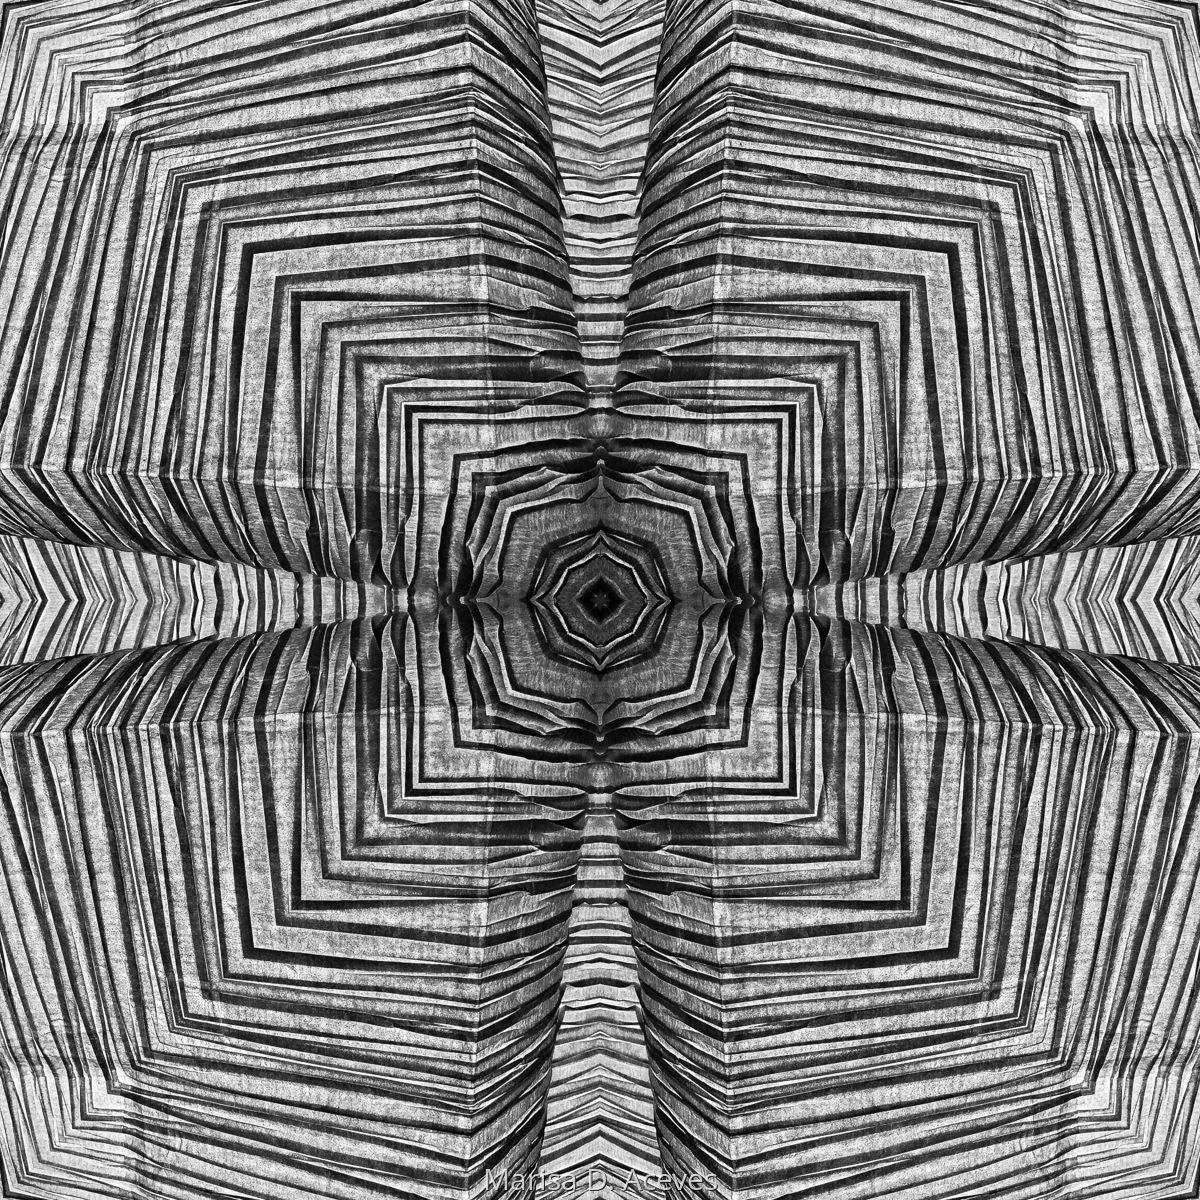 BLACK AND WHITE OPTICAL ART ZEBRA PRINT: HEART CLOVER (large view)